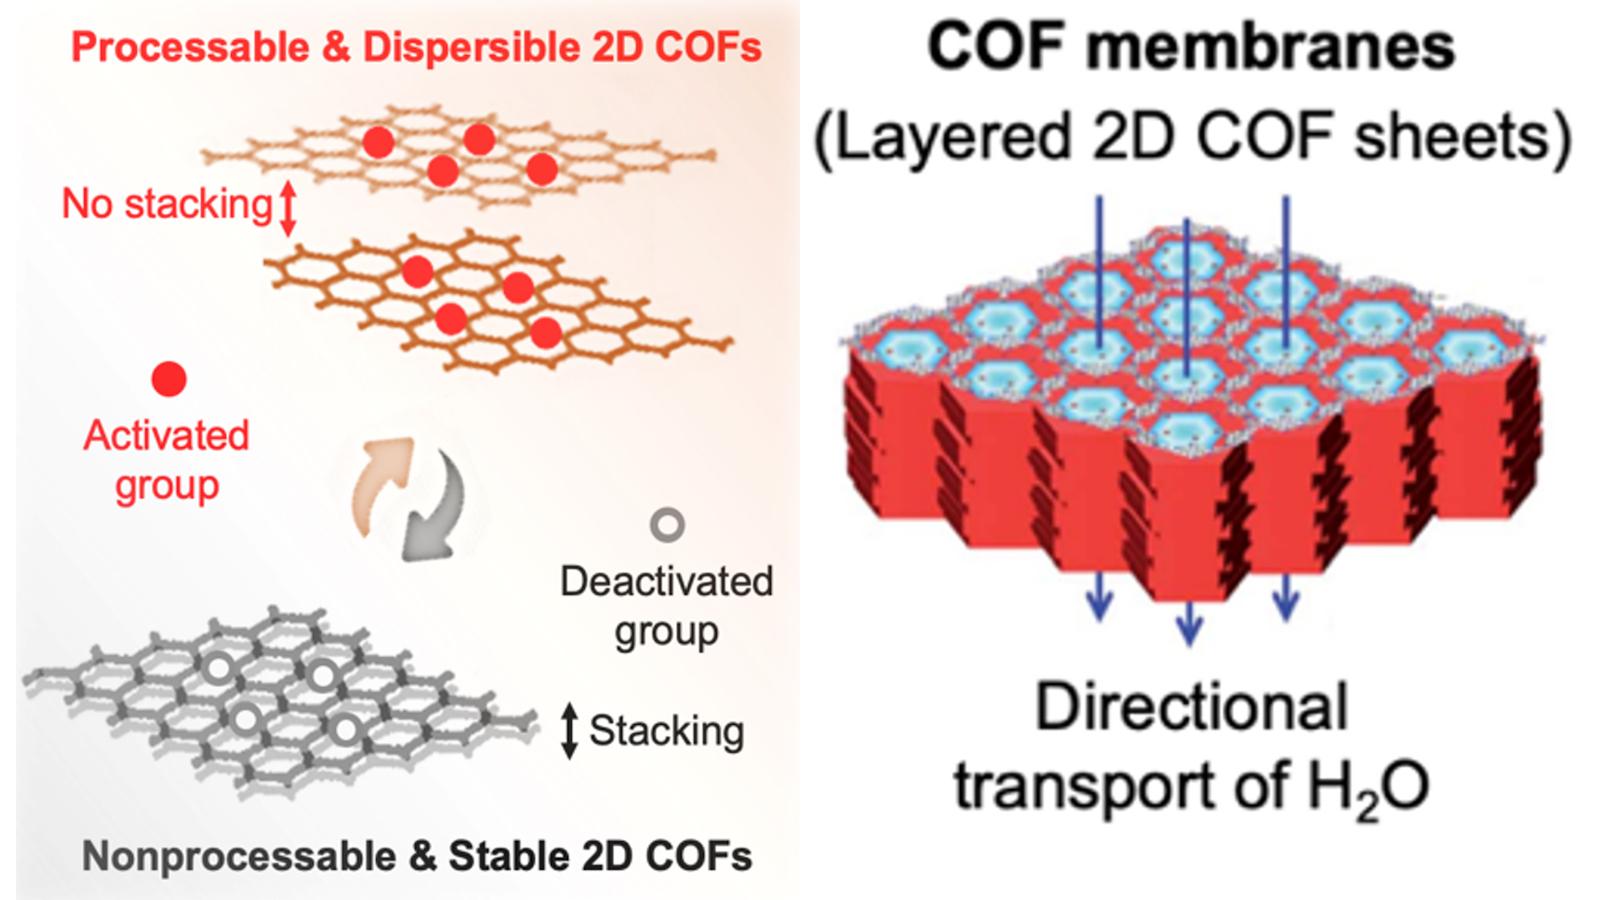 graphics depicting COF membranes